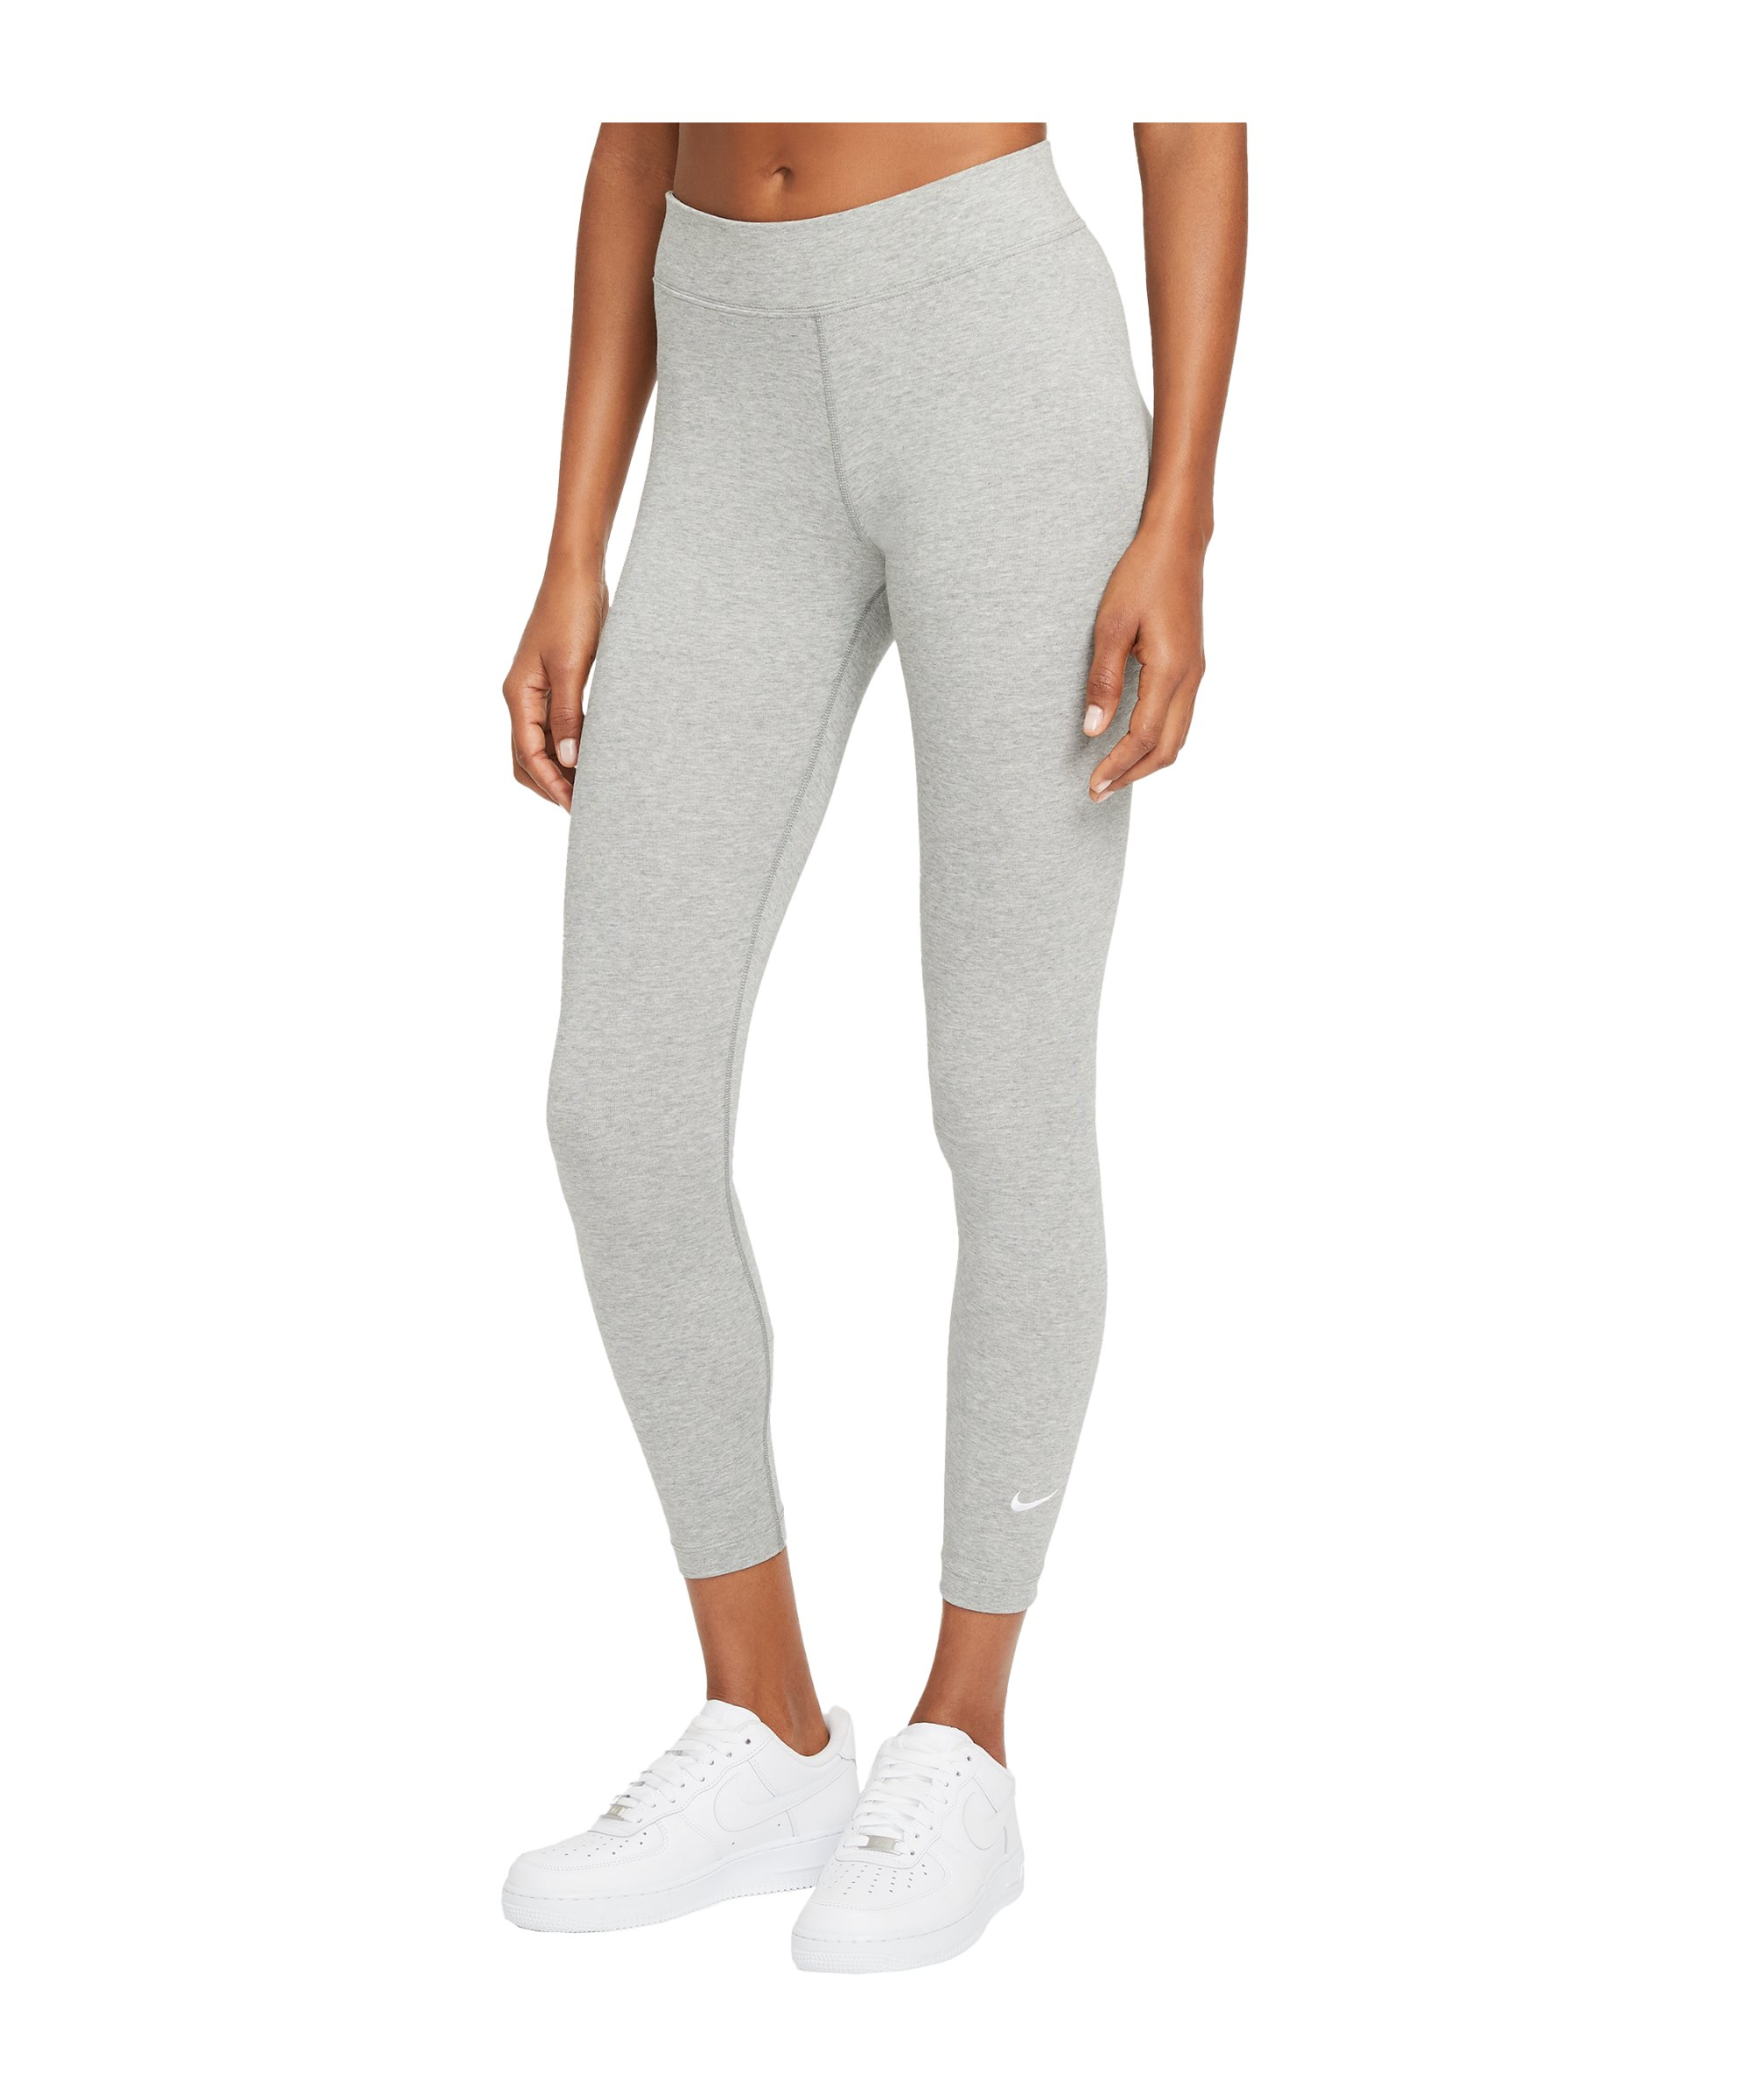 Nike Essentials 7/8 Leggings Damen Grau Weiss F010 - grau